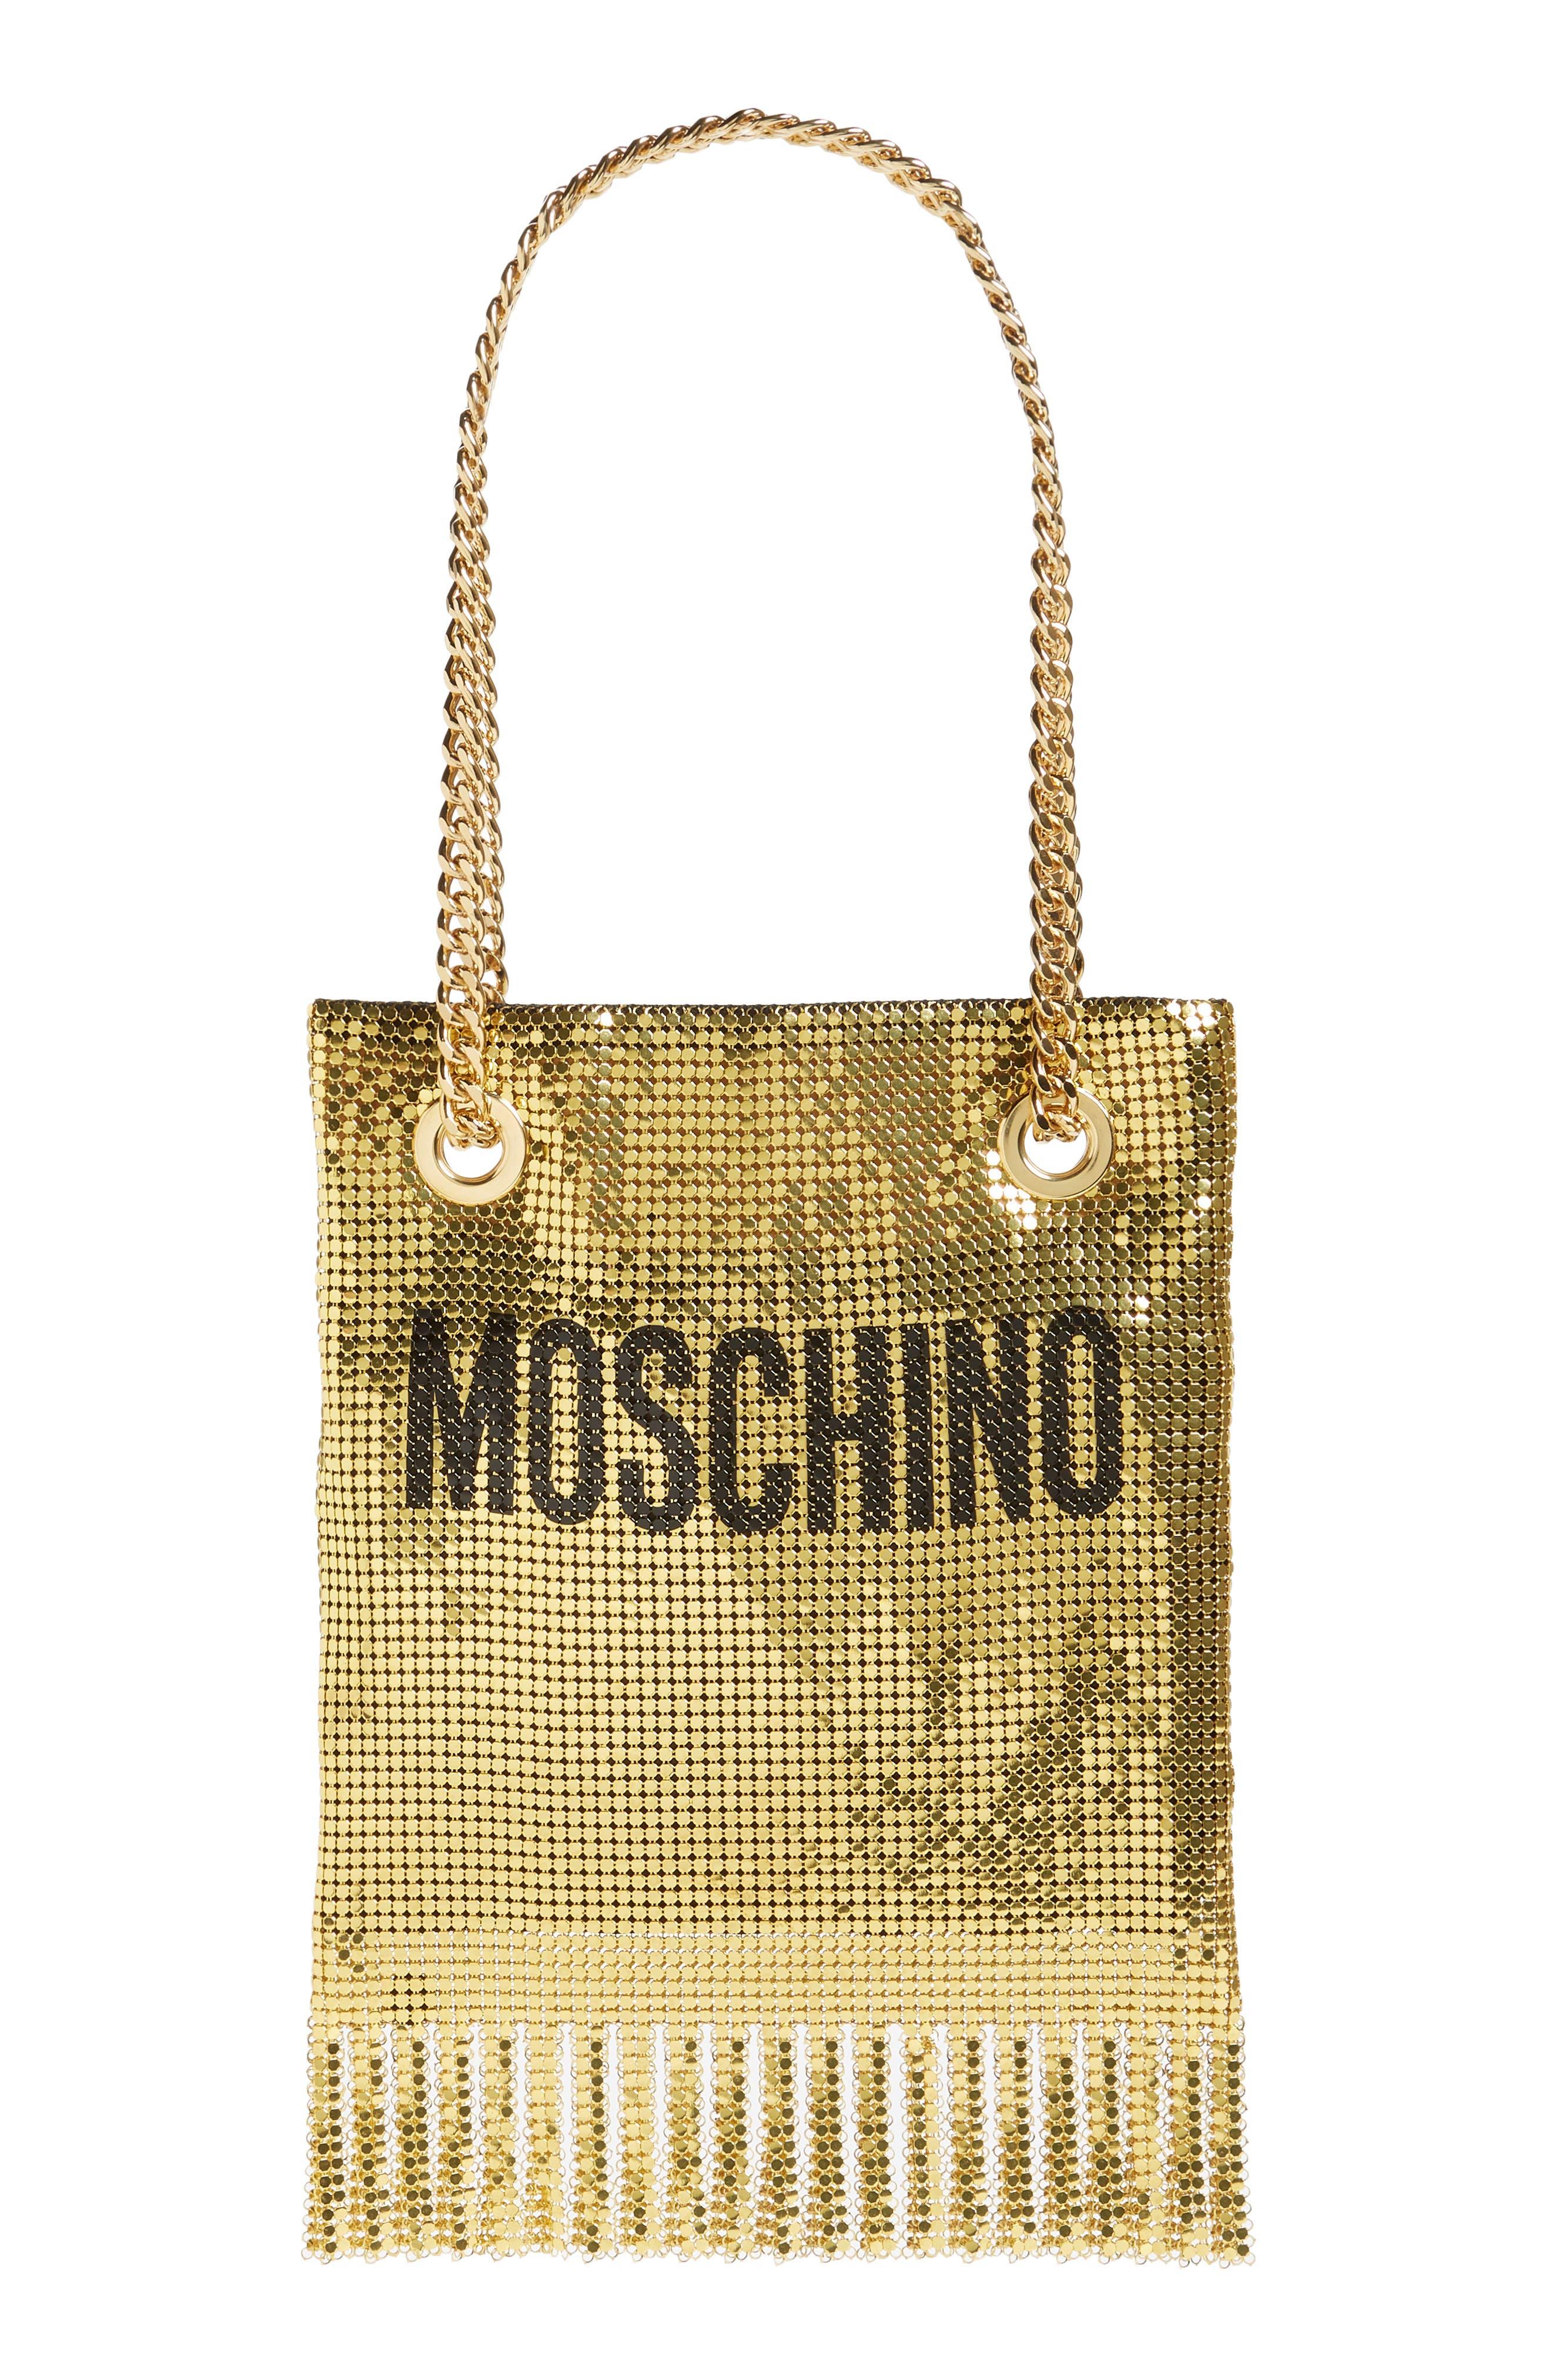 MOSCHINO, Logo Metallic Mesh Fringe Bag, Main thumbnail 1, color, GOLD